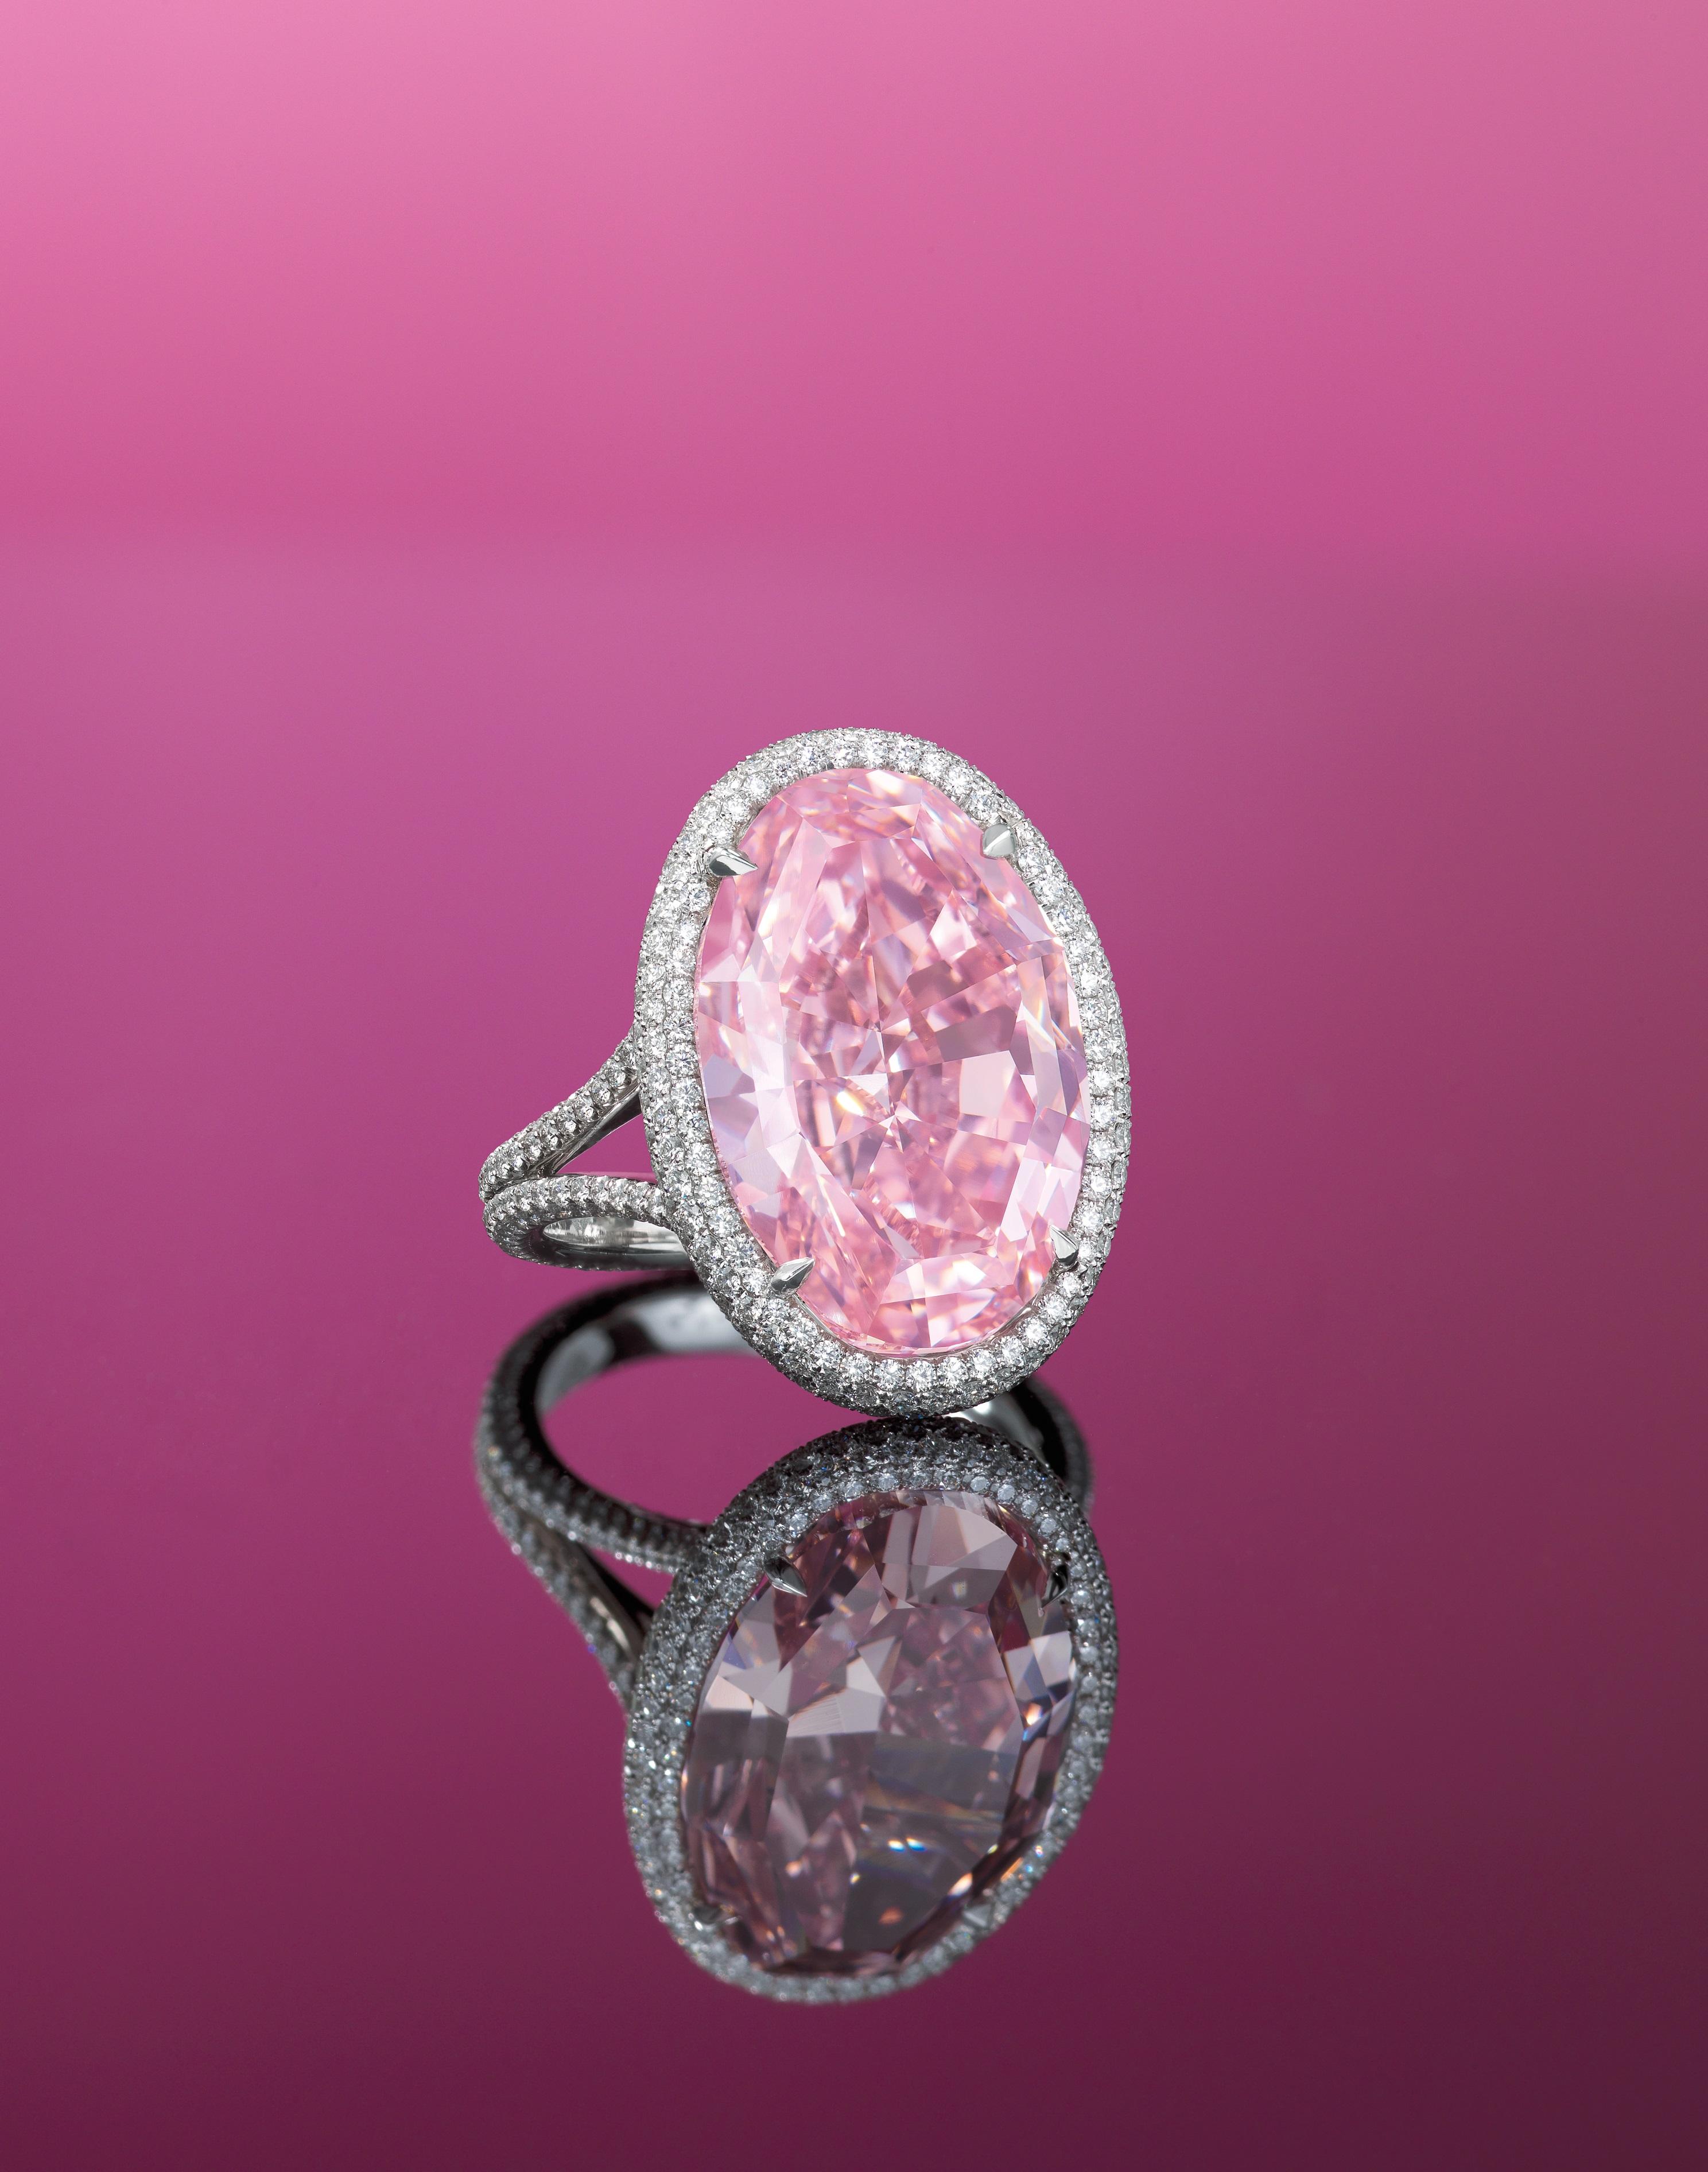 Magnificent Peony Pink Diamond - CEO News